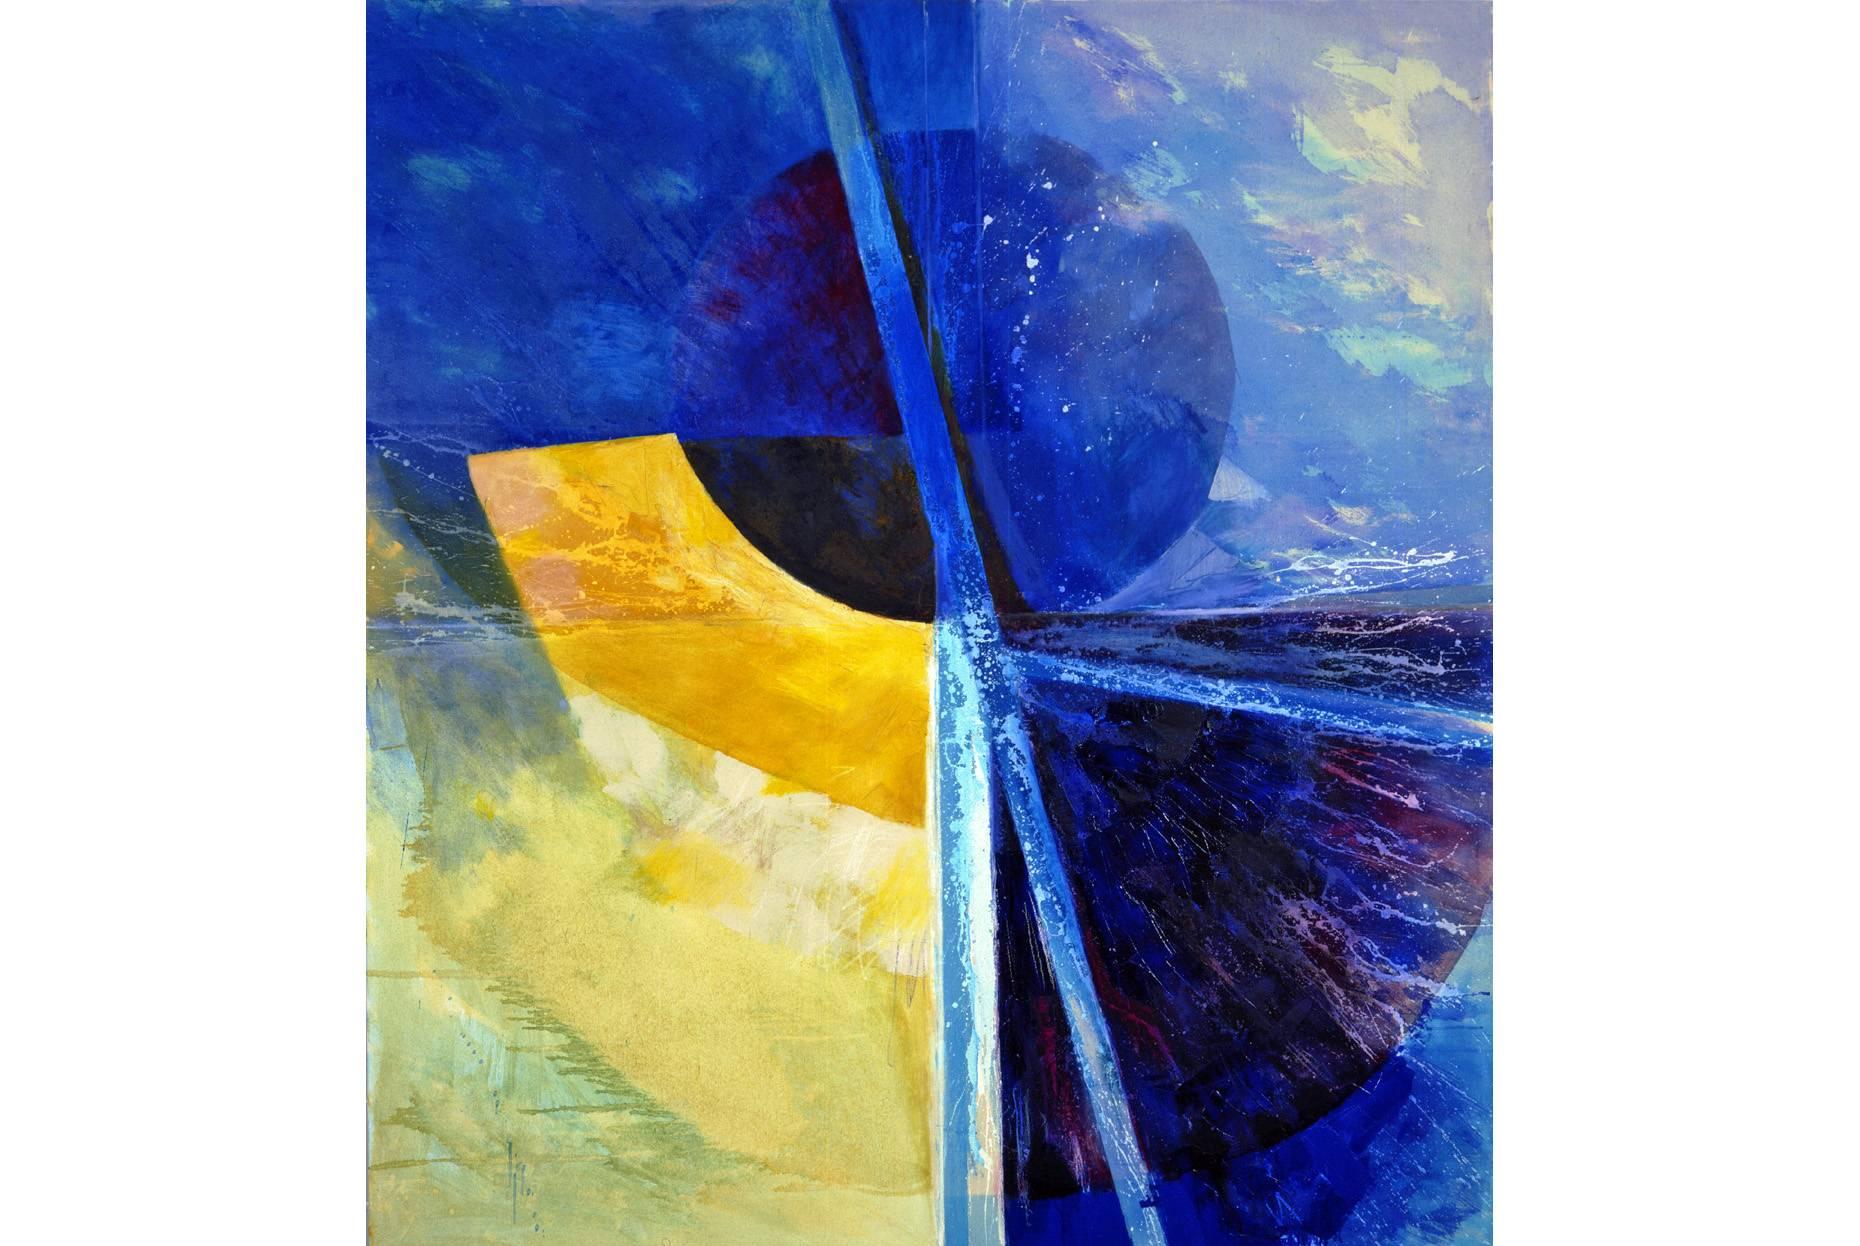 o.T. 1990 Pigment Acrylspachtel und Ölfarbe a/Nessel 190 x 170 cm